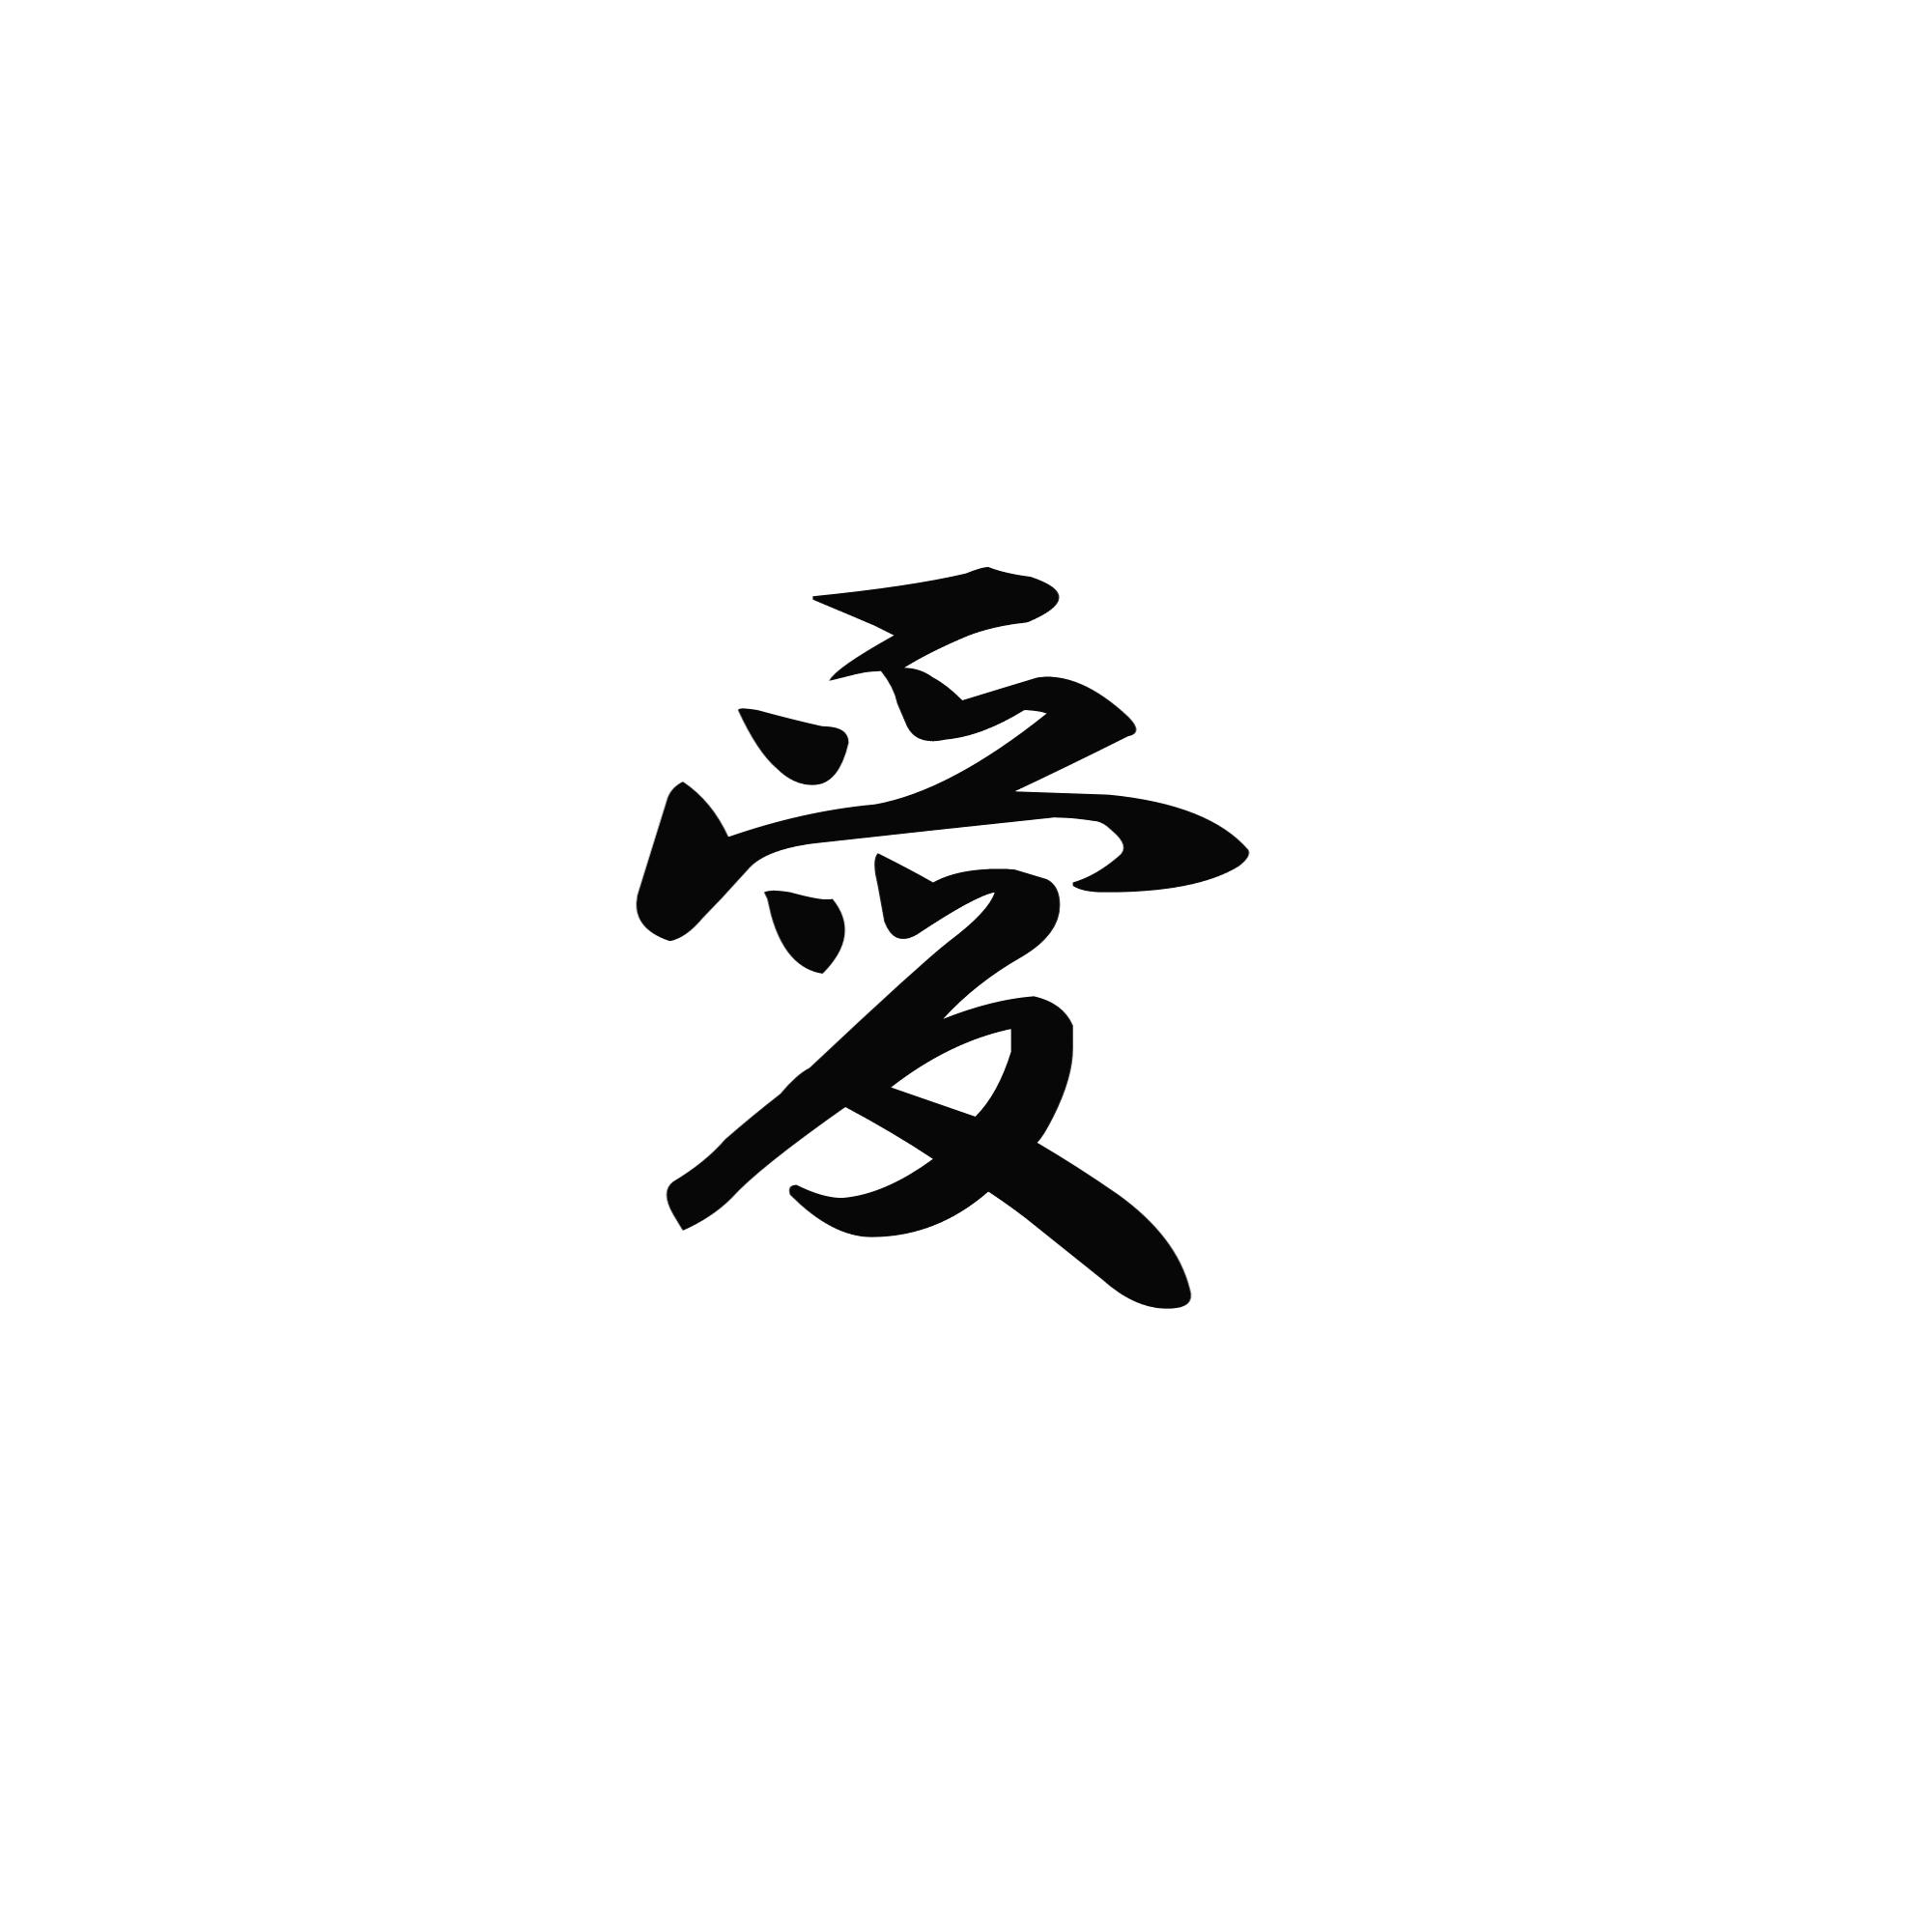 Kanjioops kanji love love buycottarizona Images